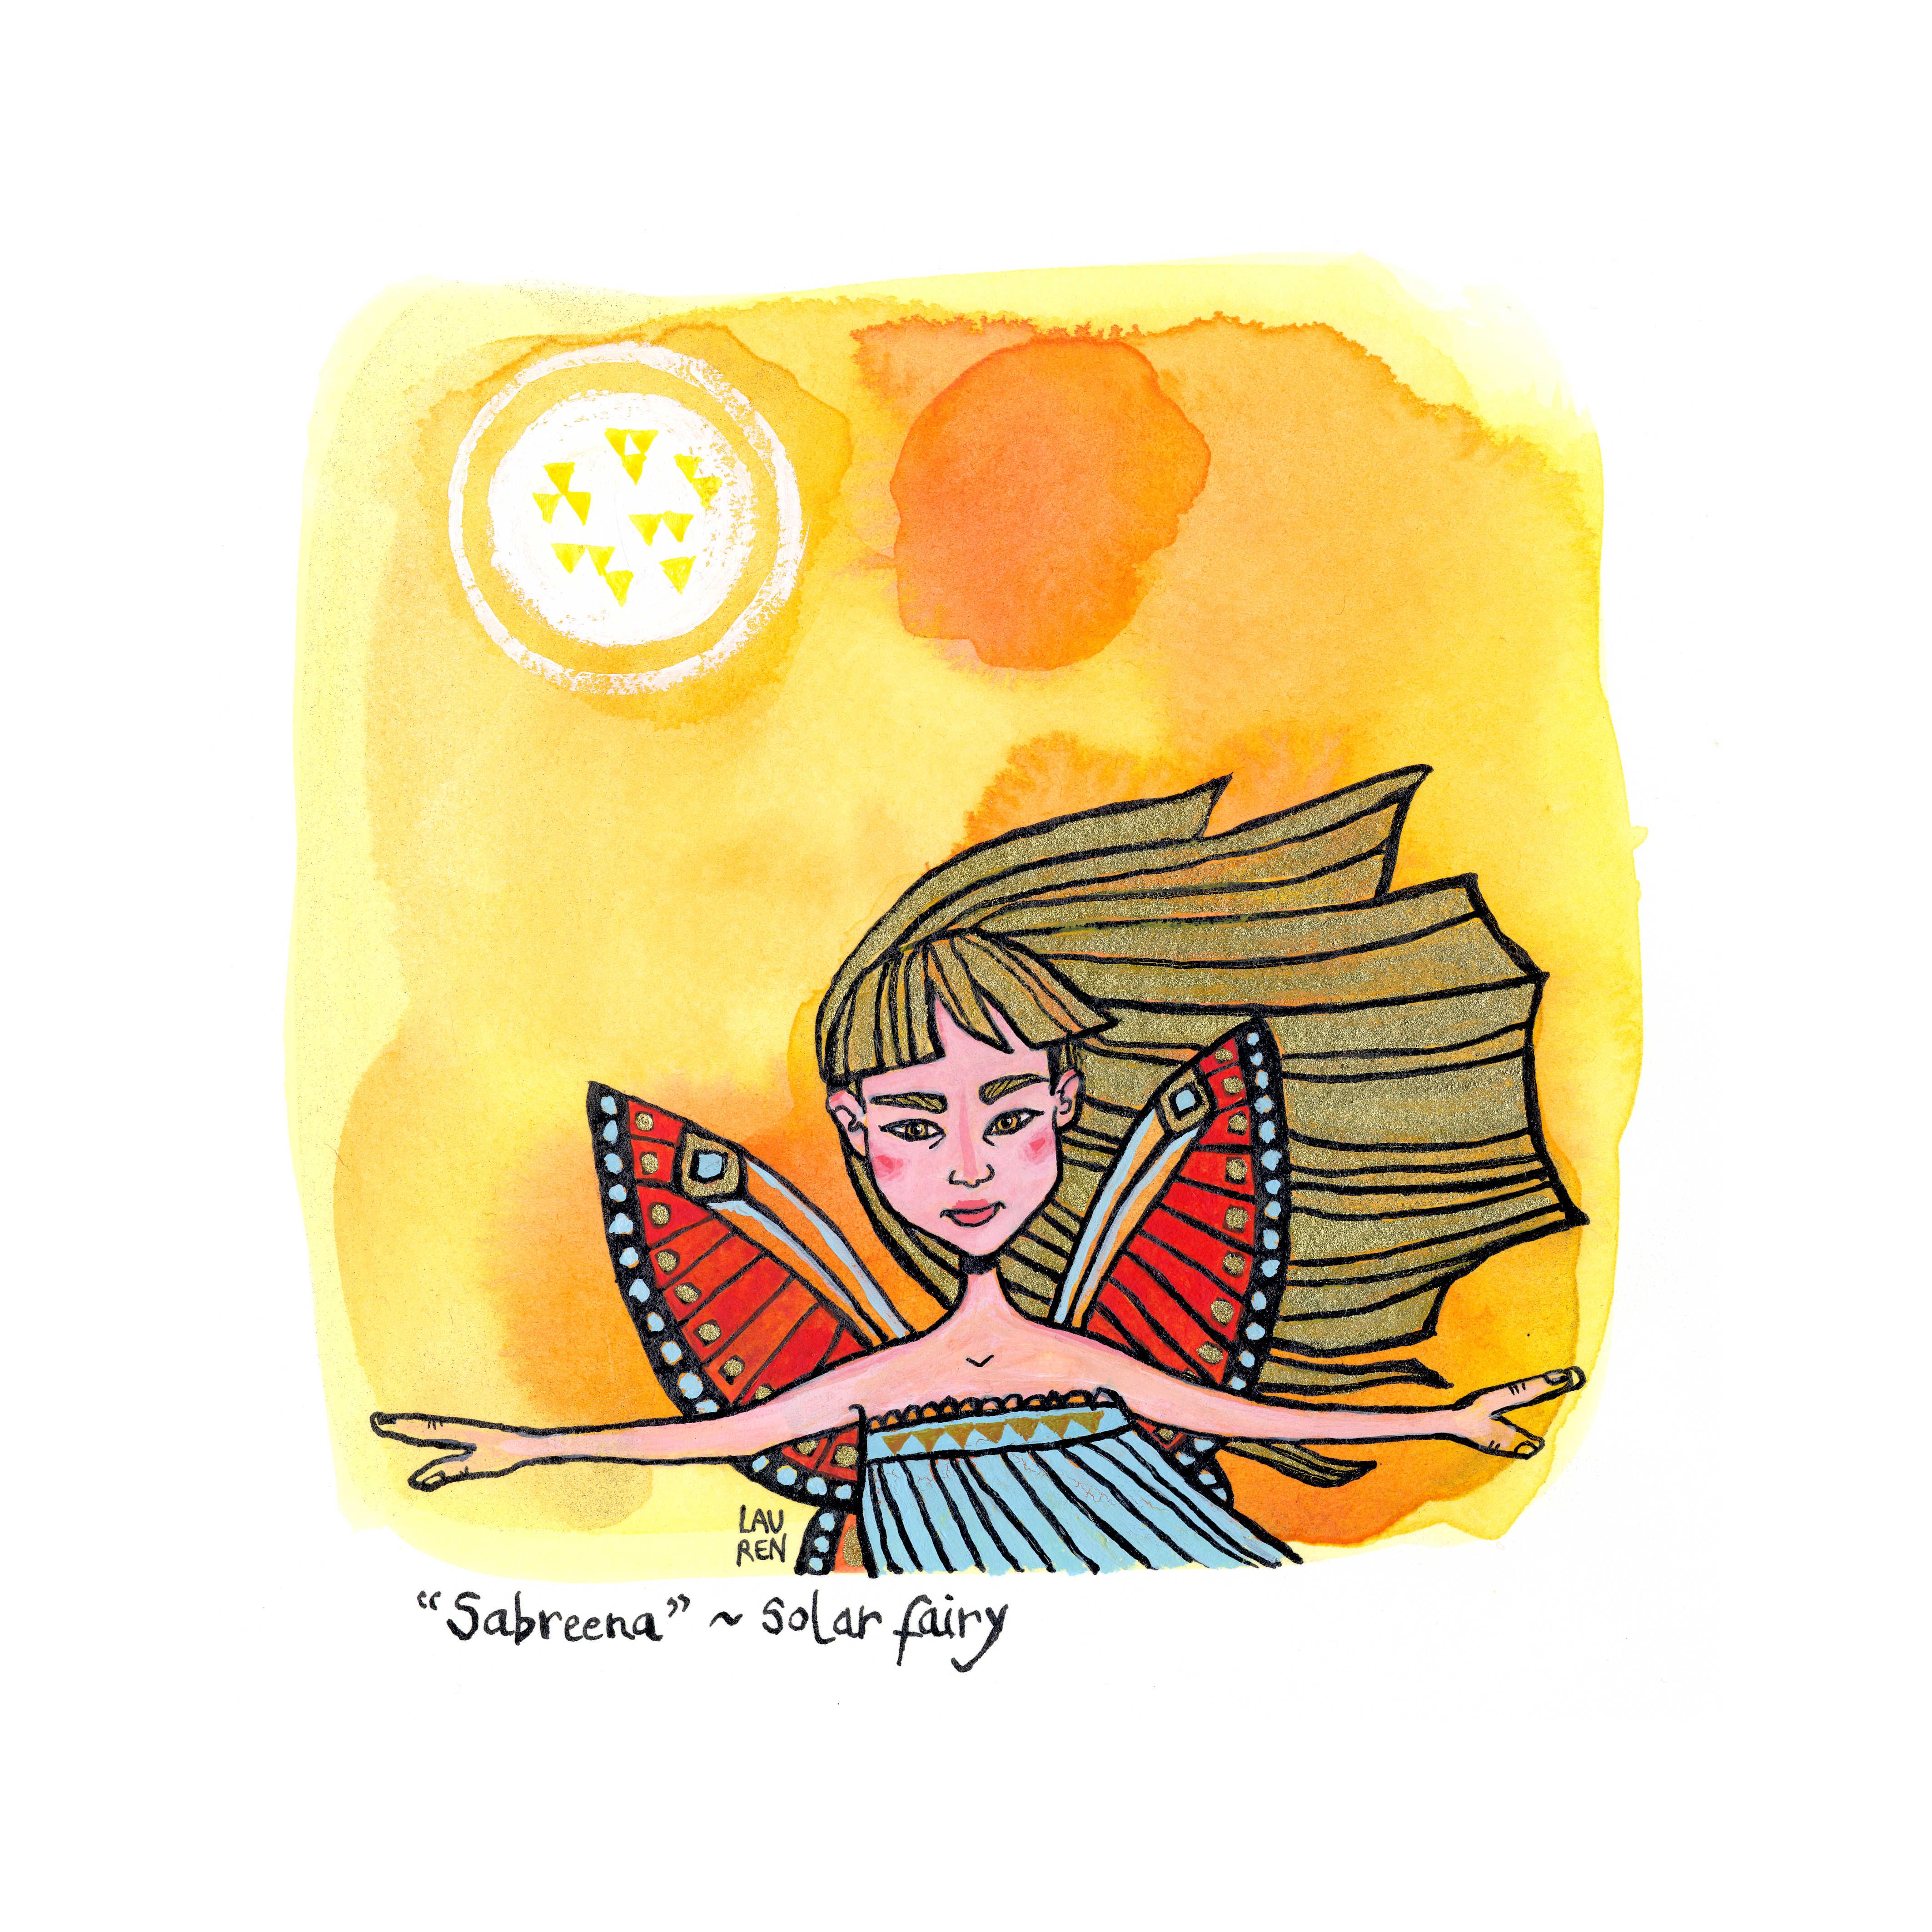 Sabreena - Solar Fairy